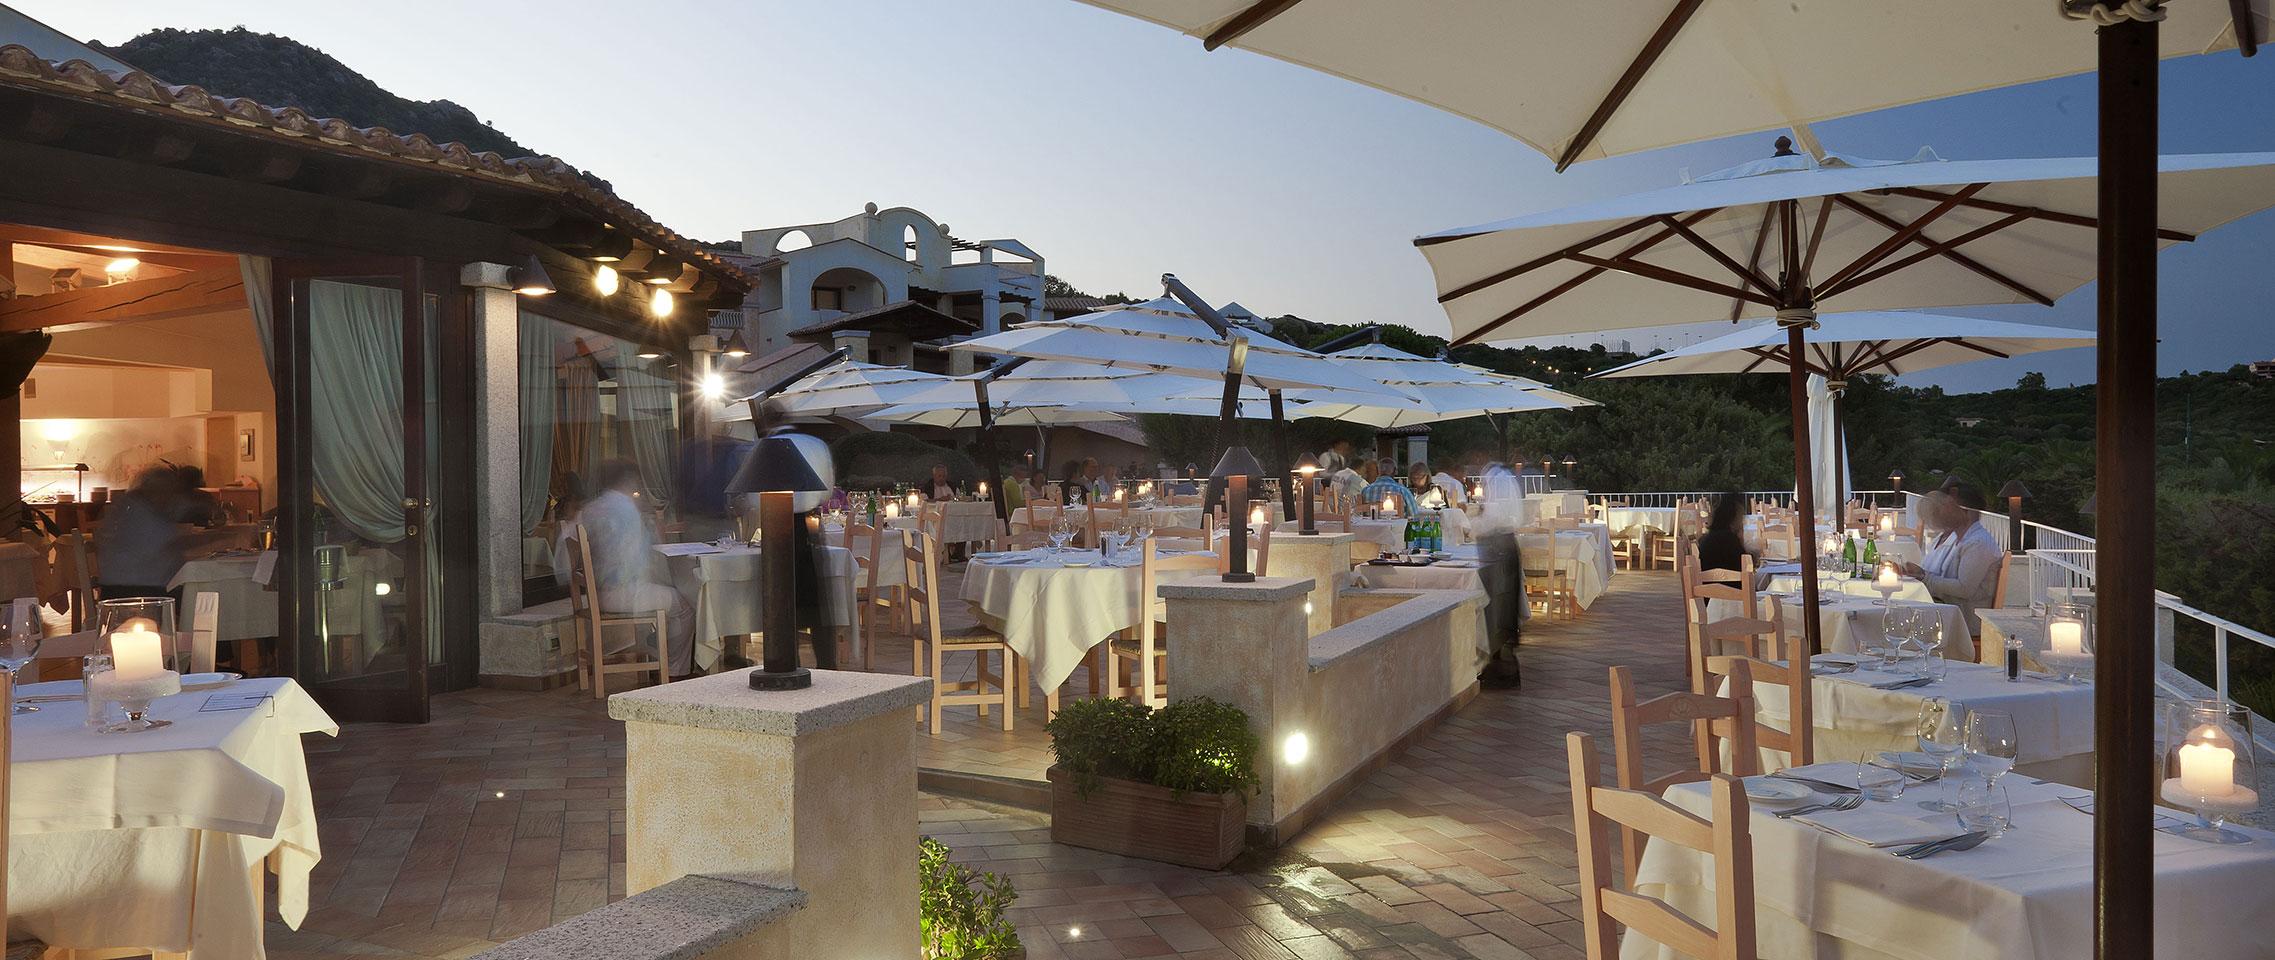 Hotel Abi D Oru Porto Rotondo Olbia Sardaigne